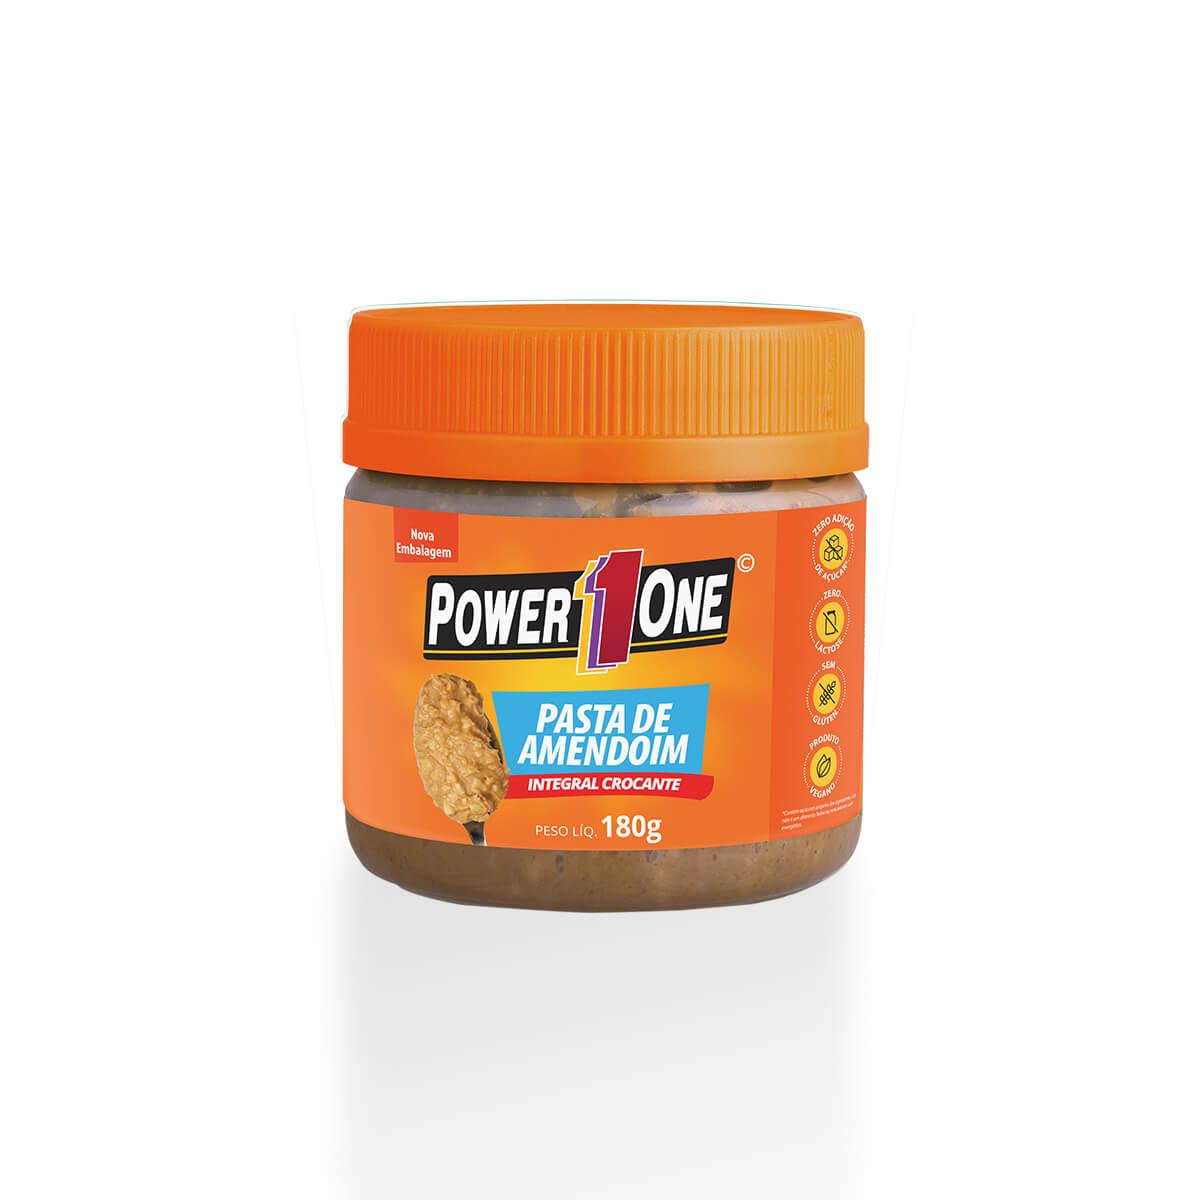 Pasta de Amendoim Integral Crocante (180g) - Power1One